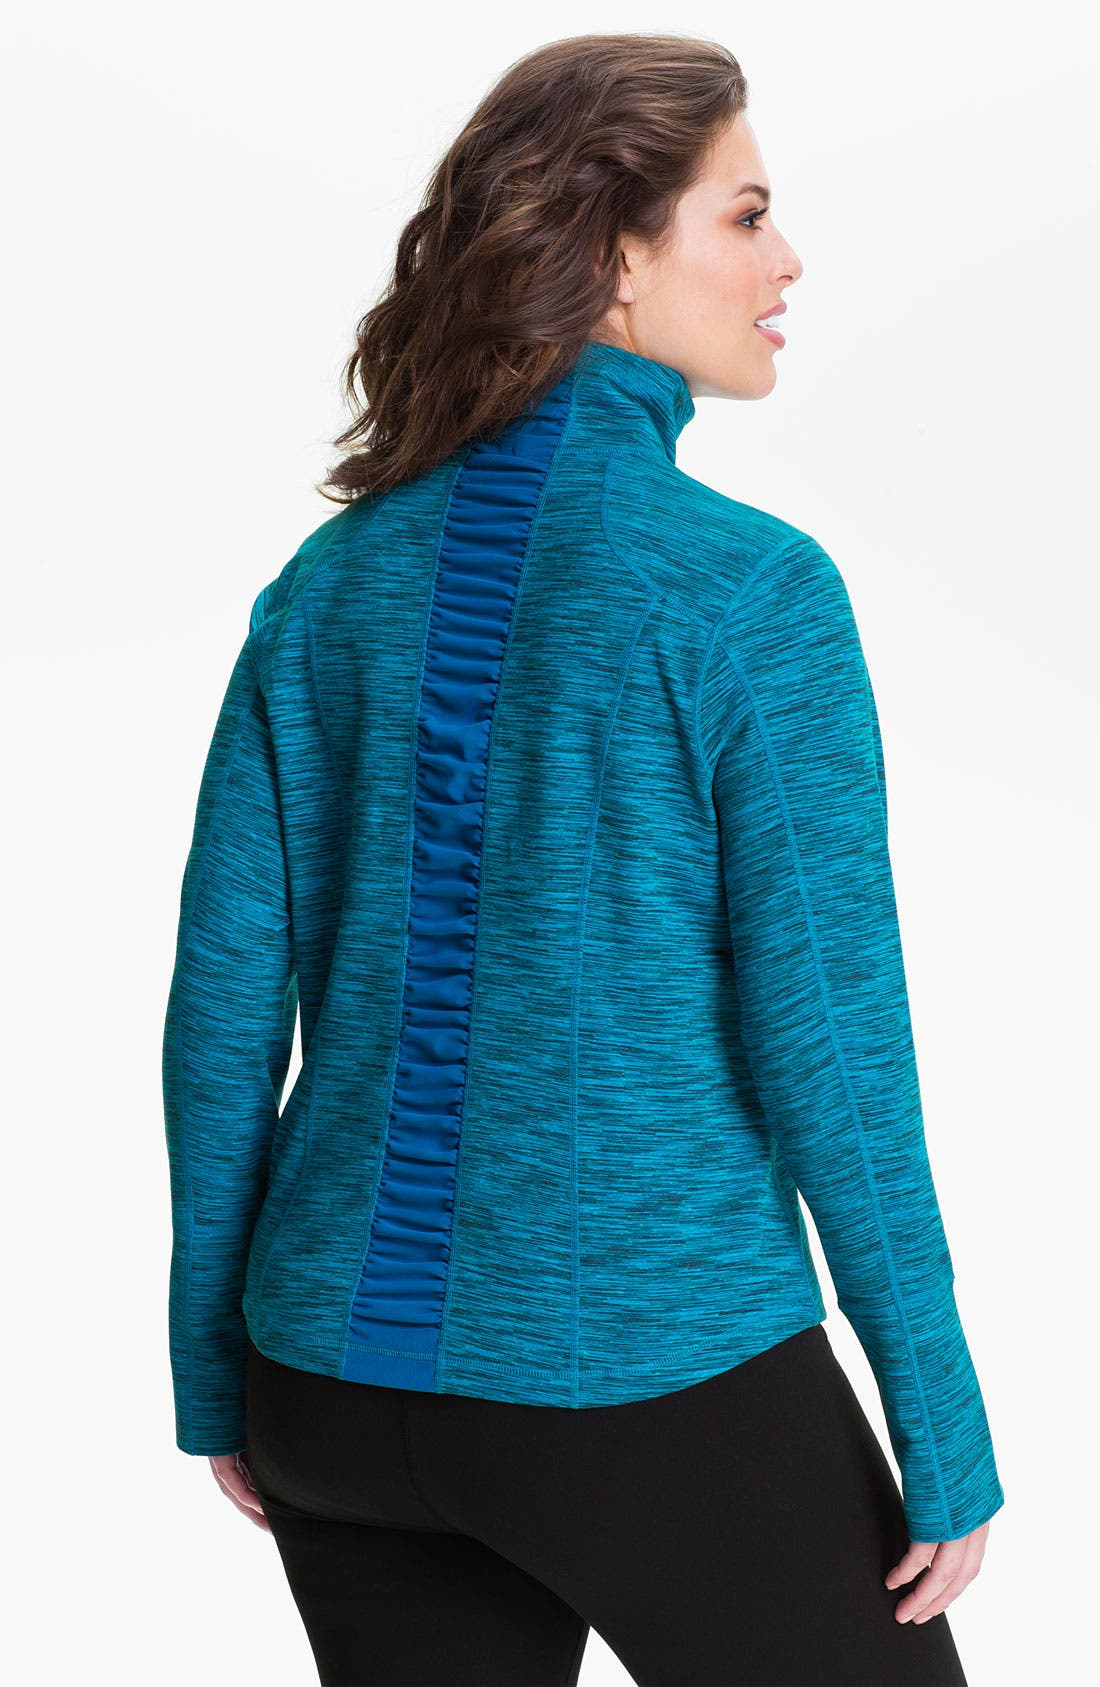 Alternate Image 1 Selected - Zella 'Sophia' Space Dye Jacket (Plus)